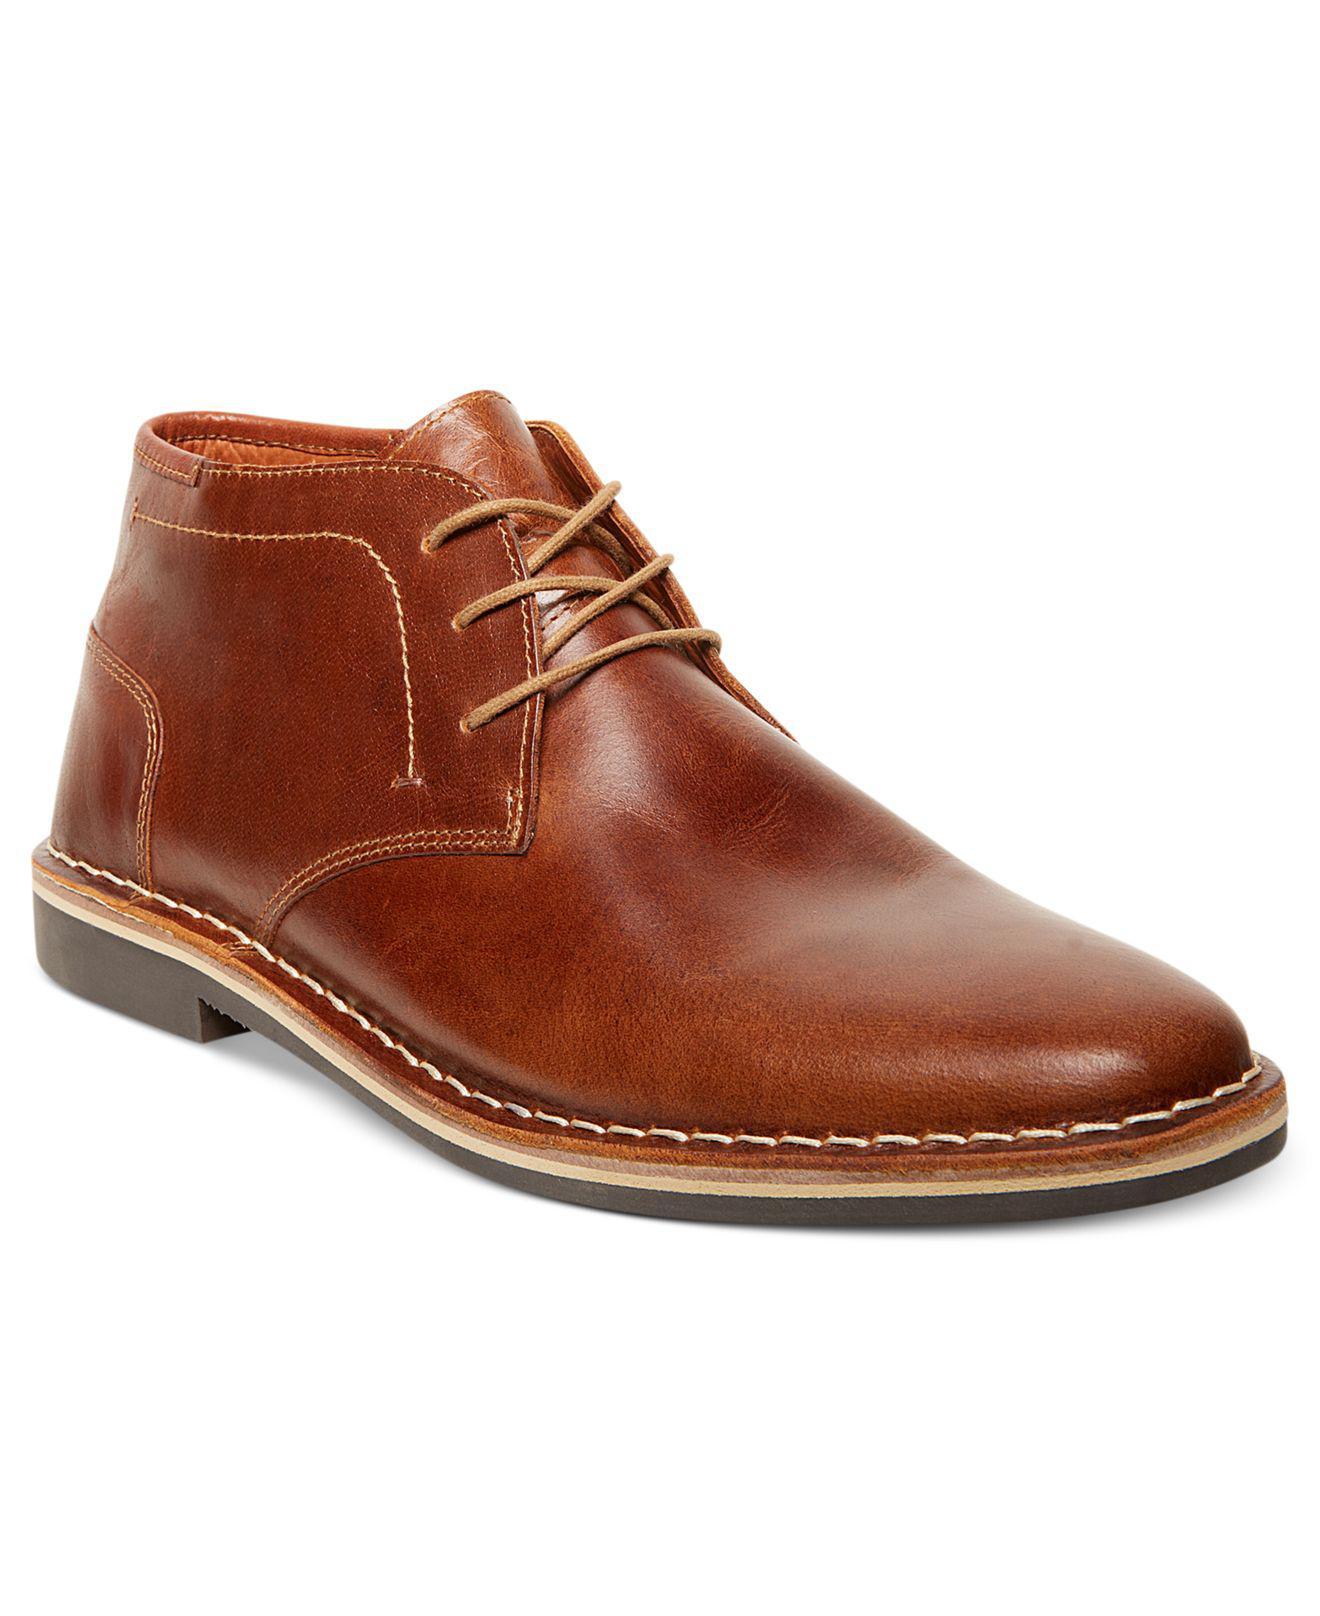 Steve Madden. Men's Black Harken Chukka Boots